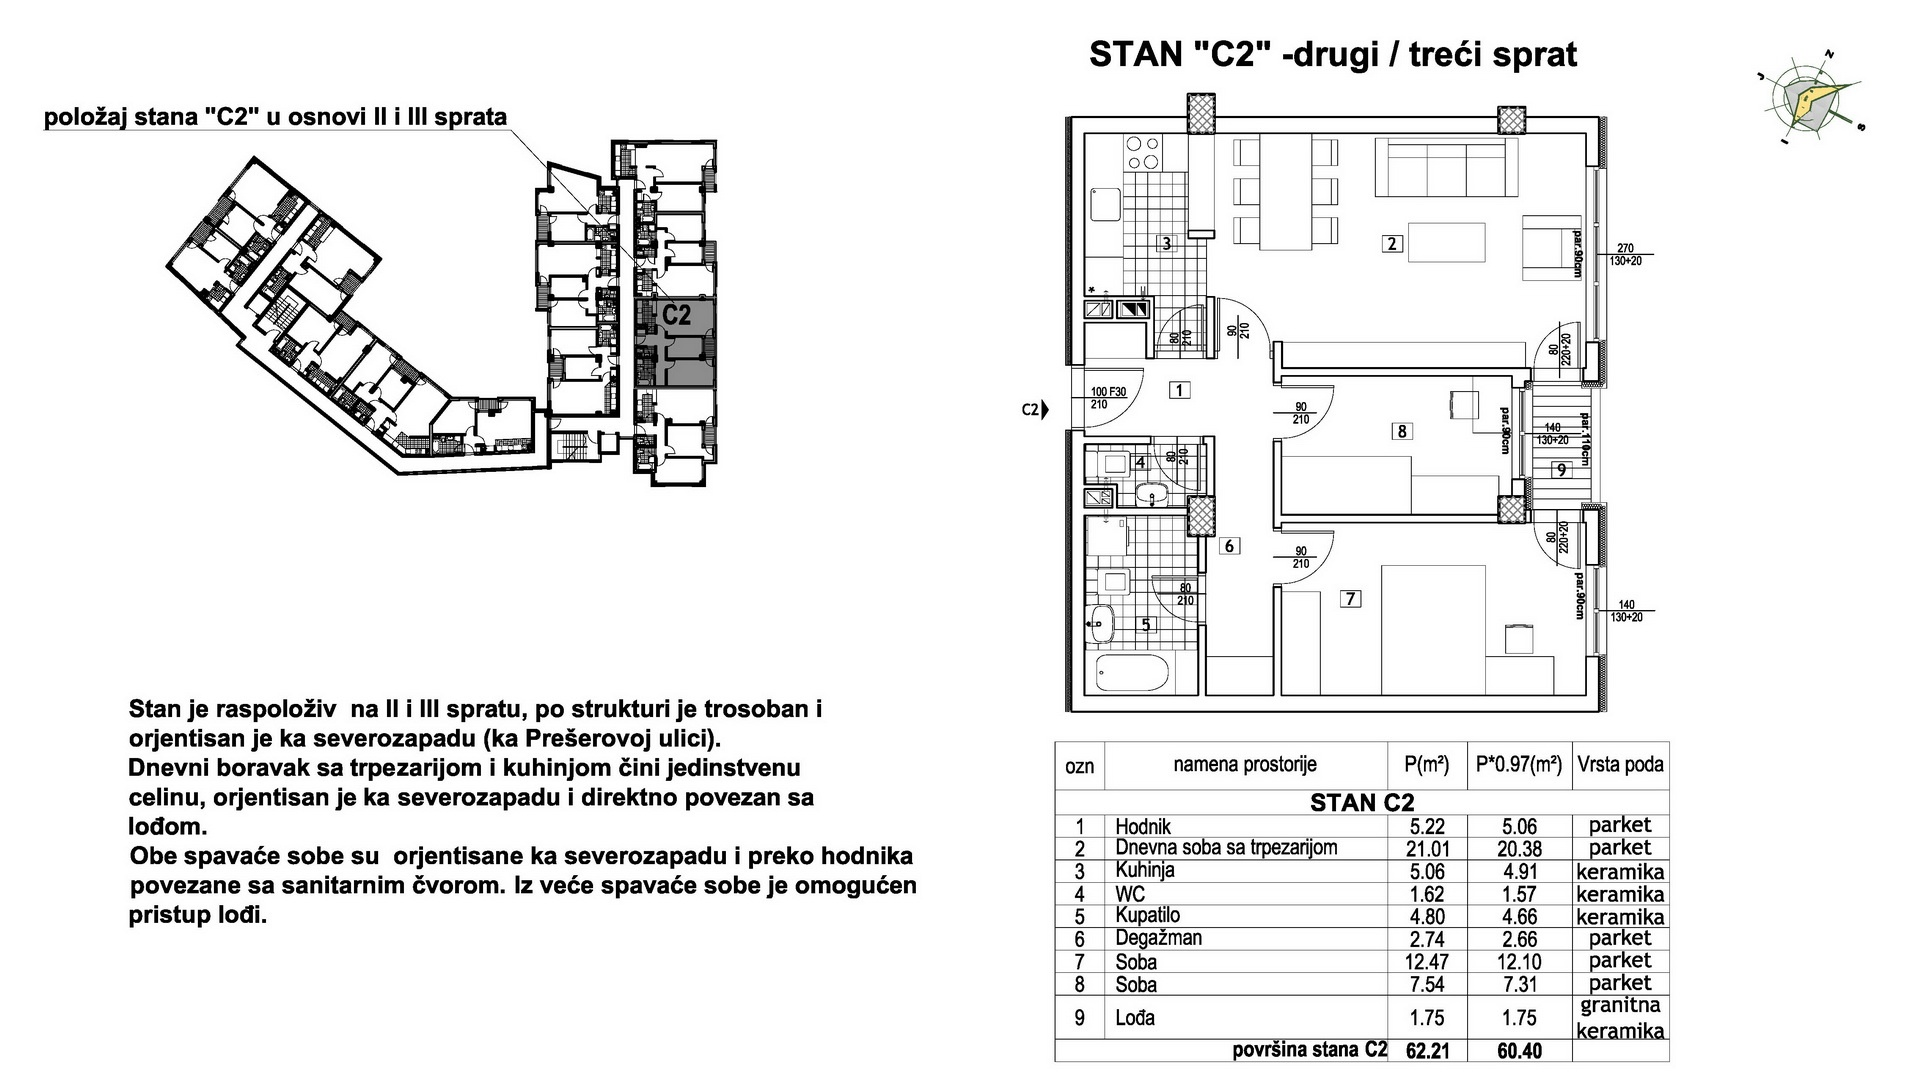 Objekat u Prešernovoj bb - Stan C2